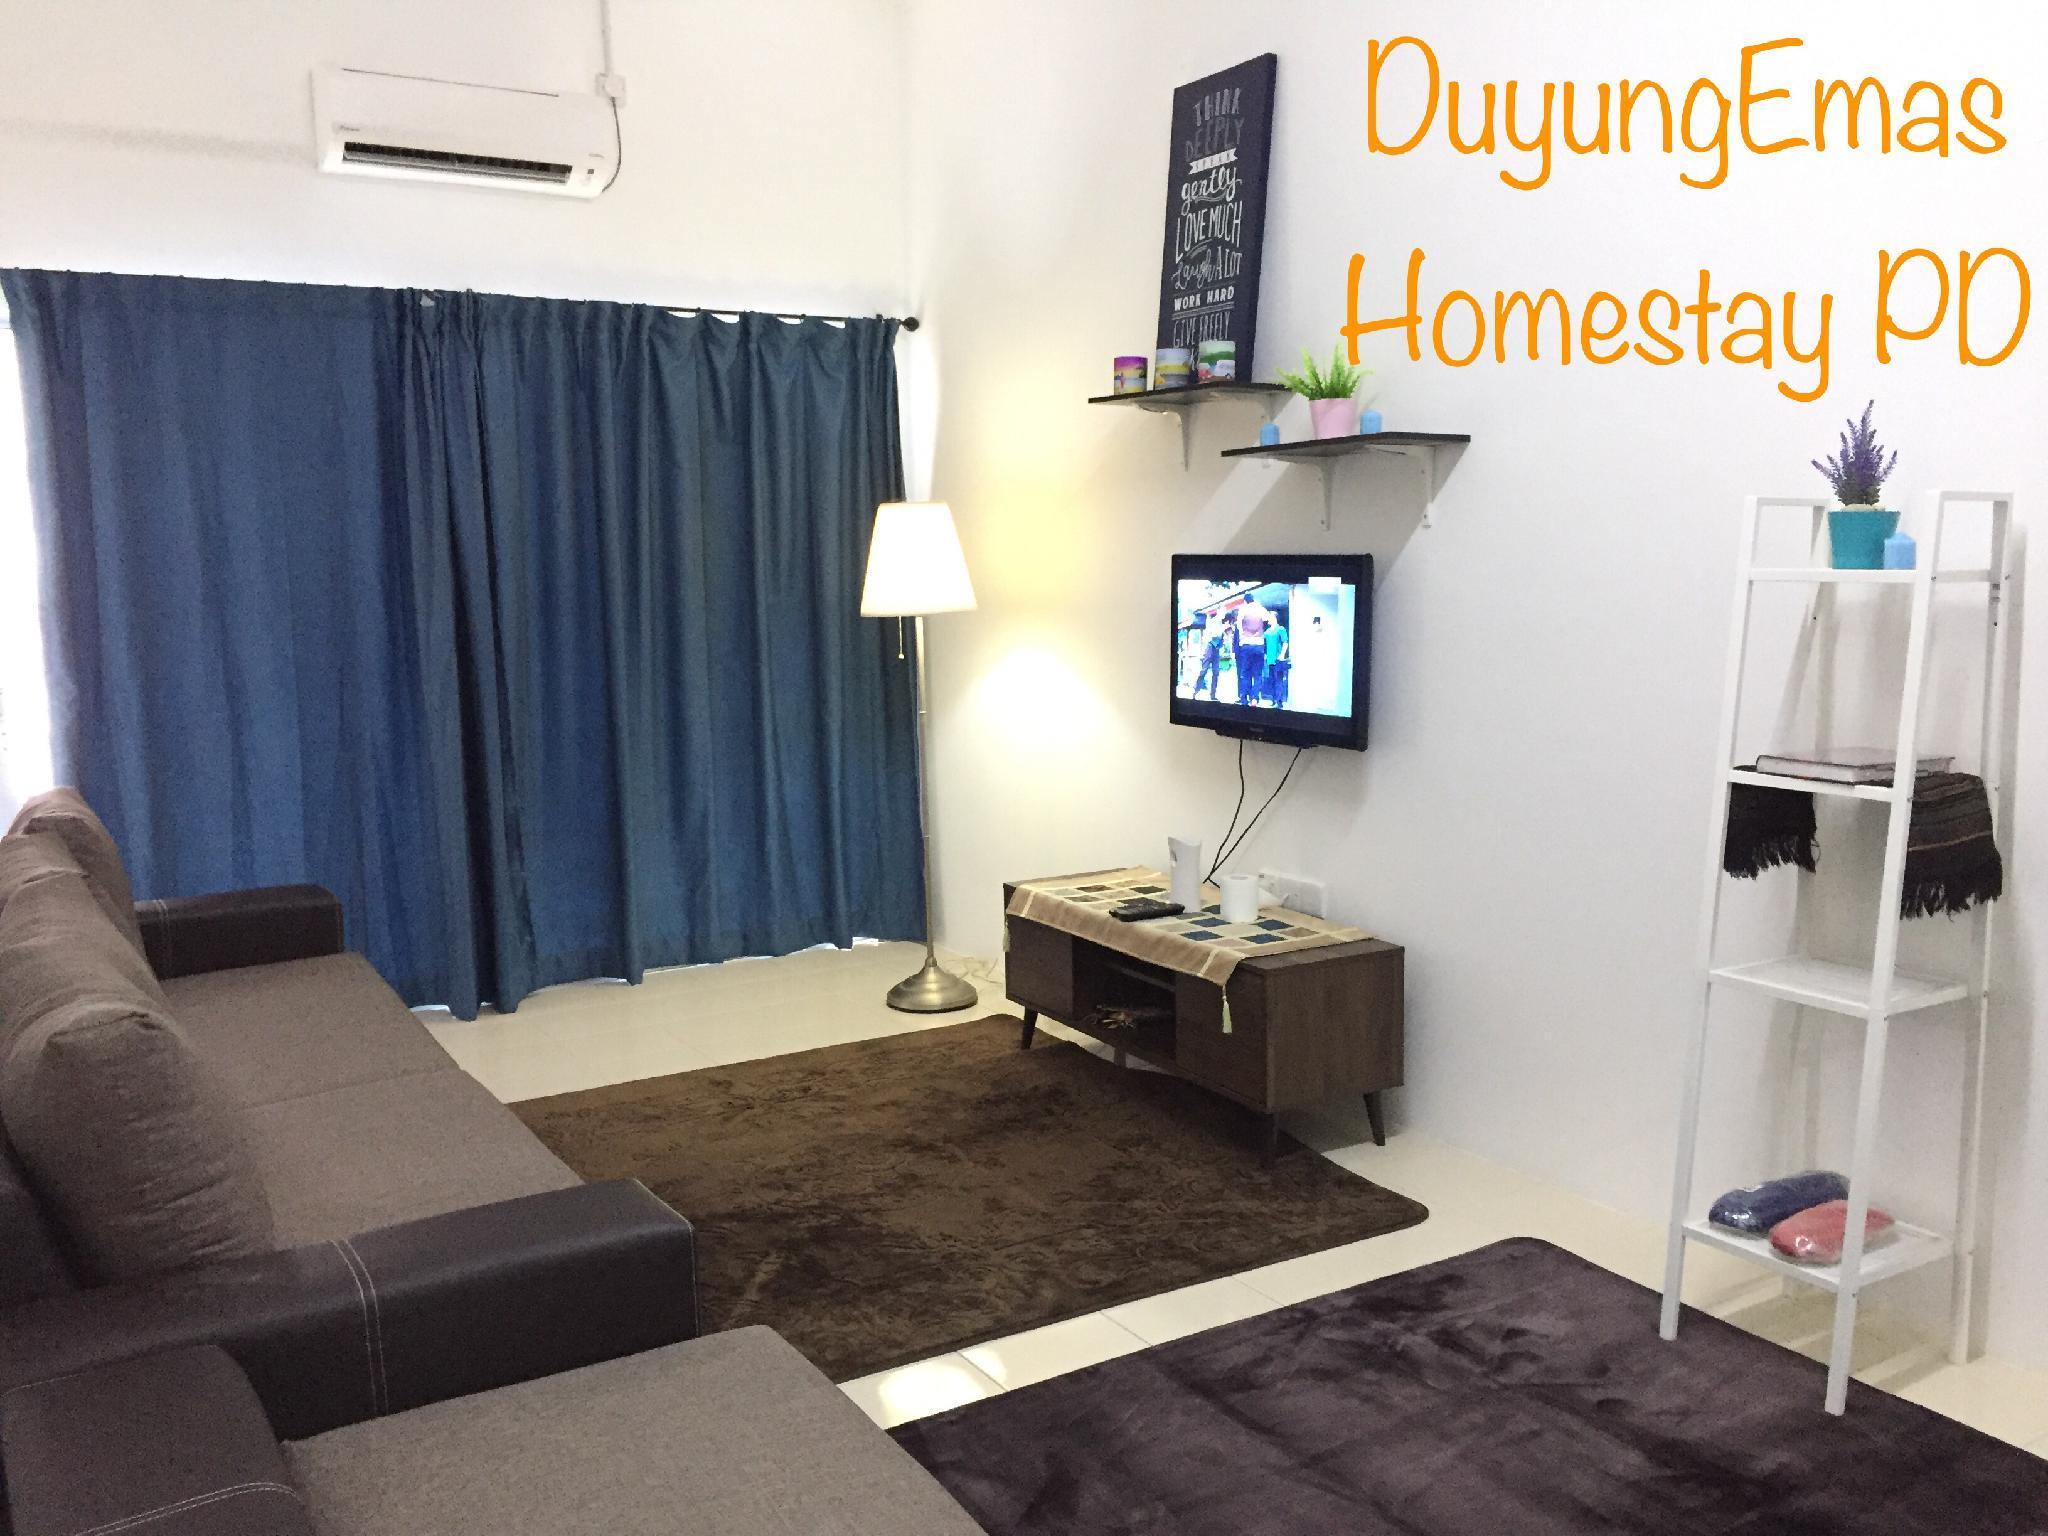 DuyungEmas Homestay Port Dickson